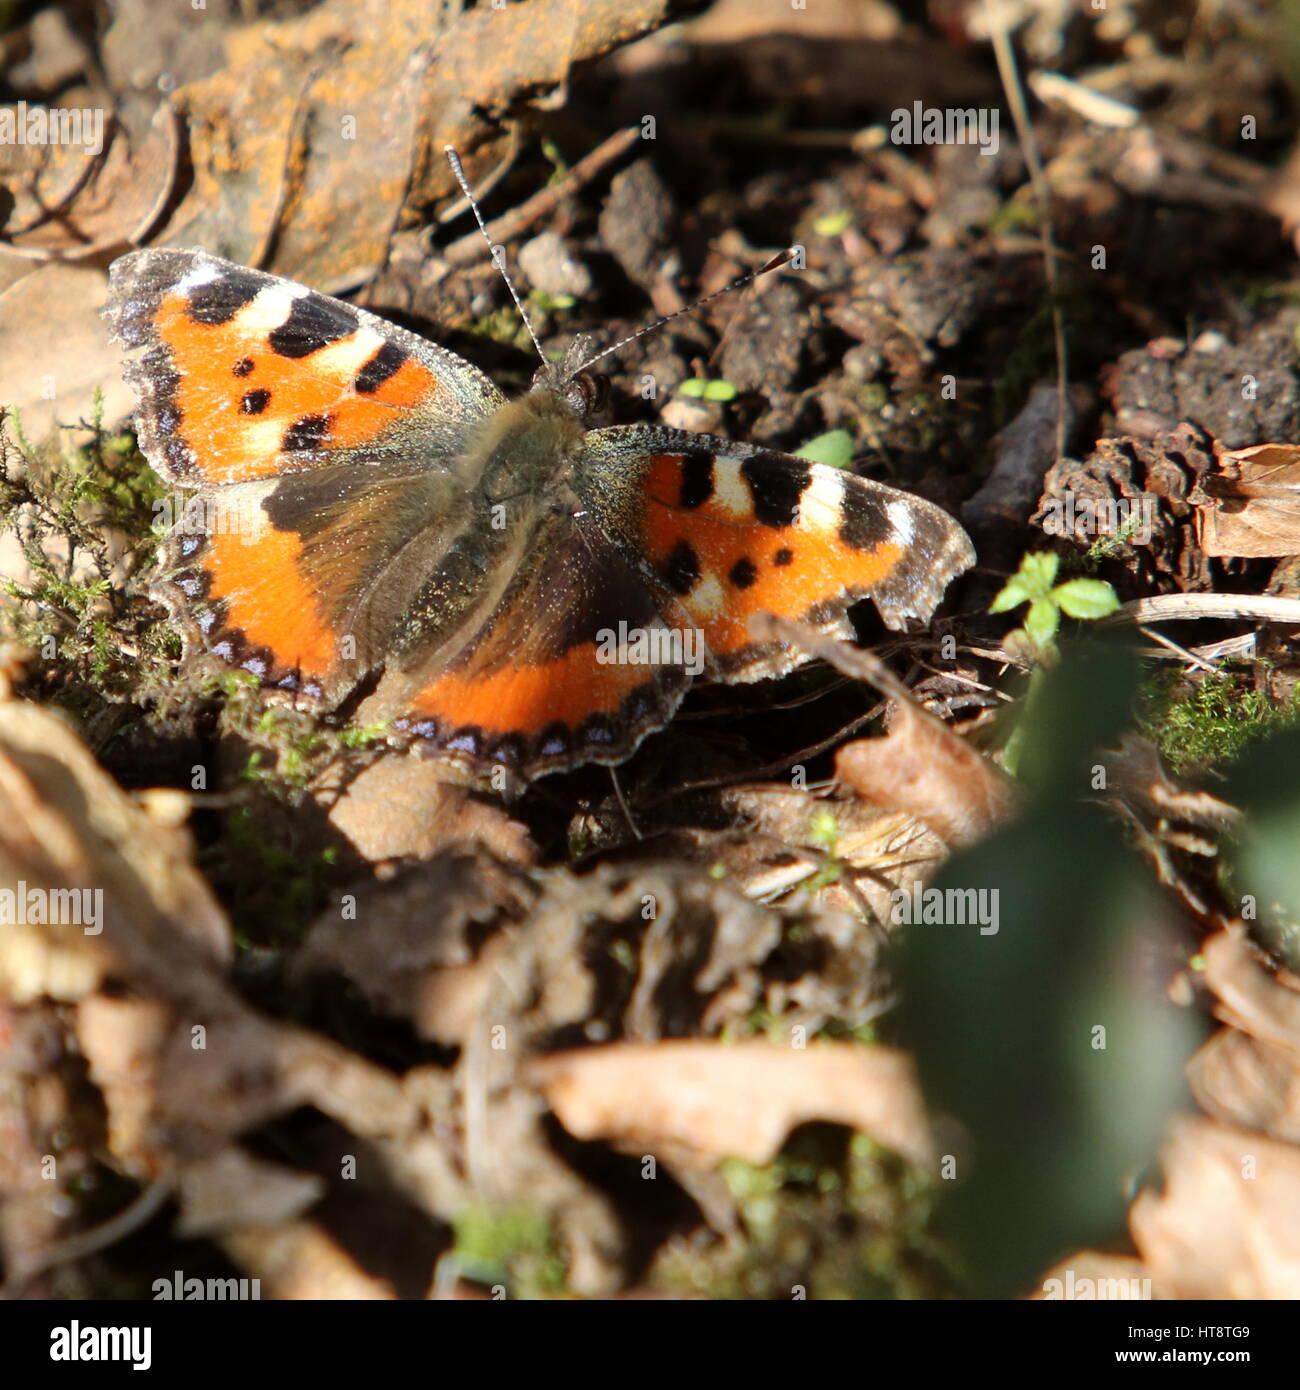 Small Tortoiseshell butterfly resting amongst leaves - Stock Image